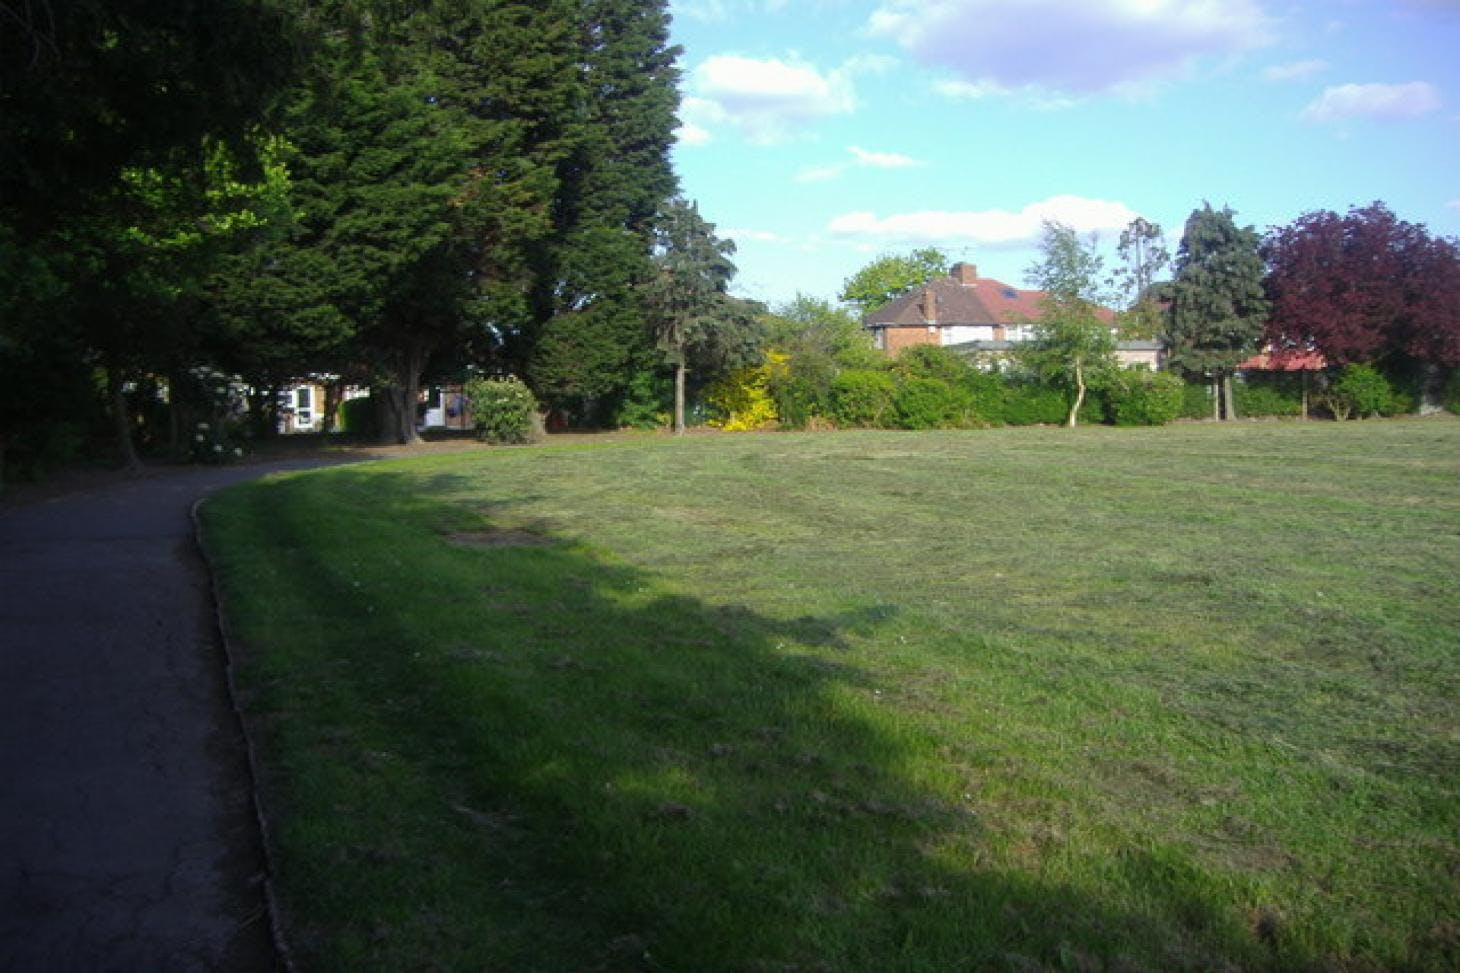 Eton Grove Open Space Outdoor   Hard (macadam) tennis court